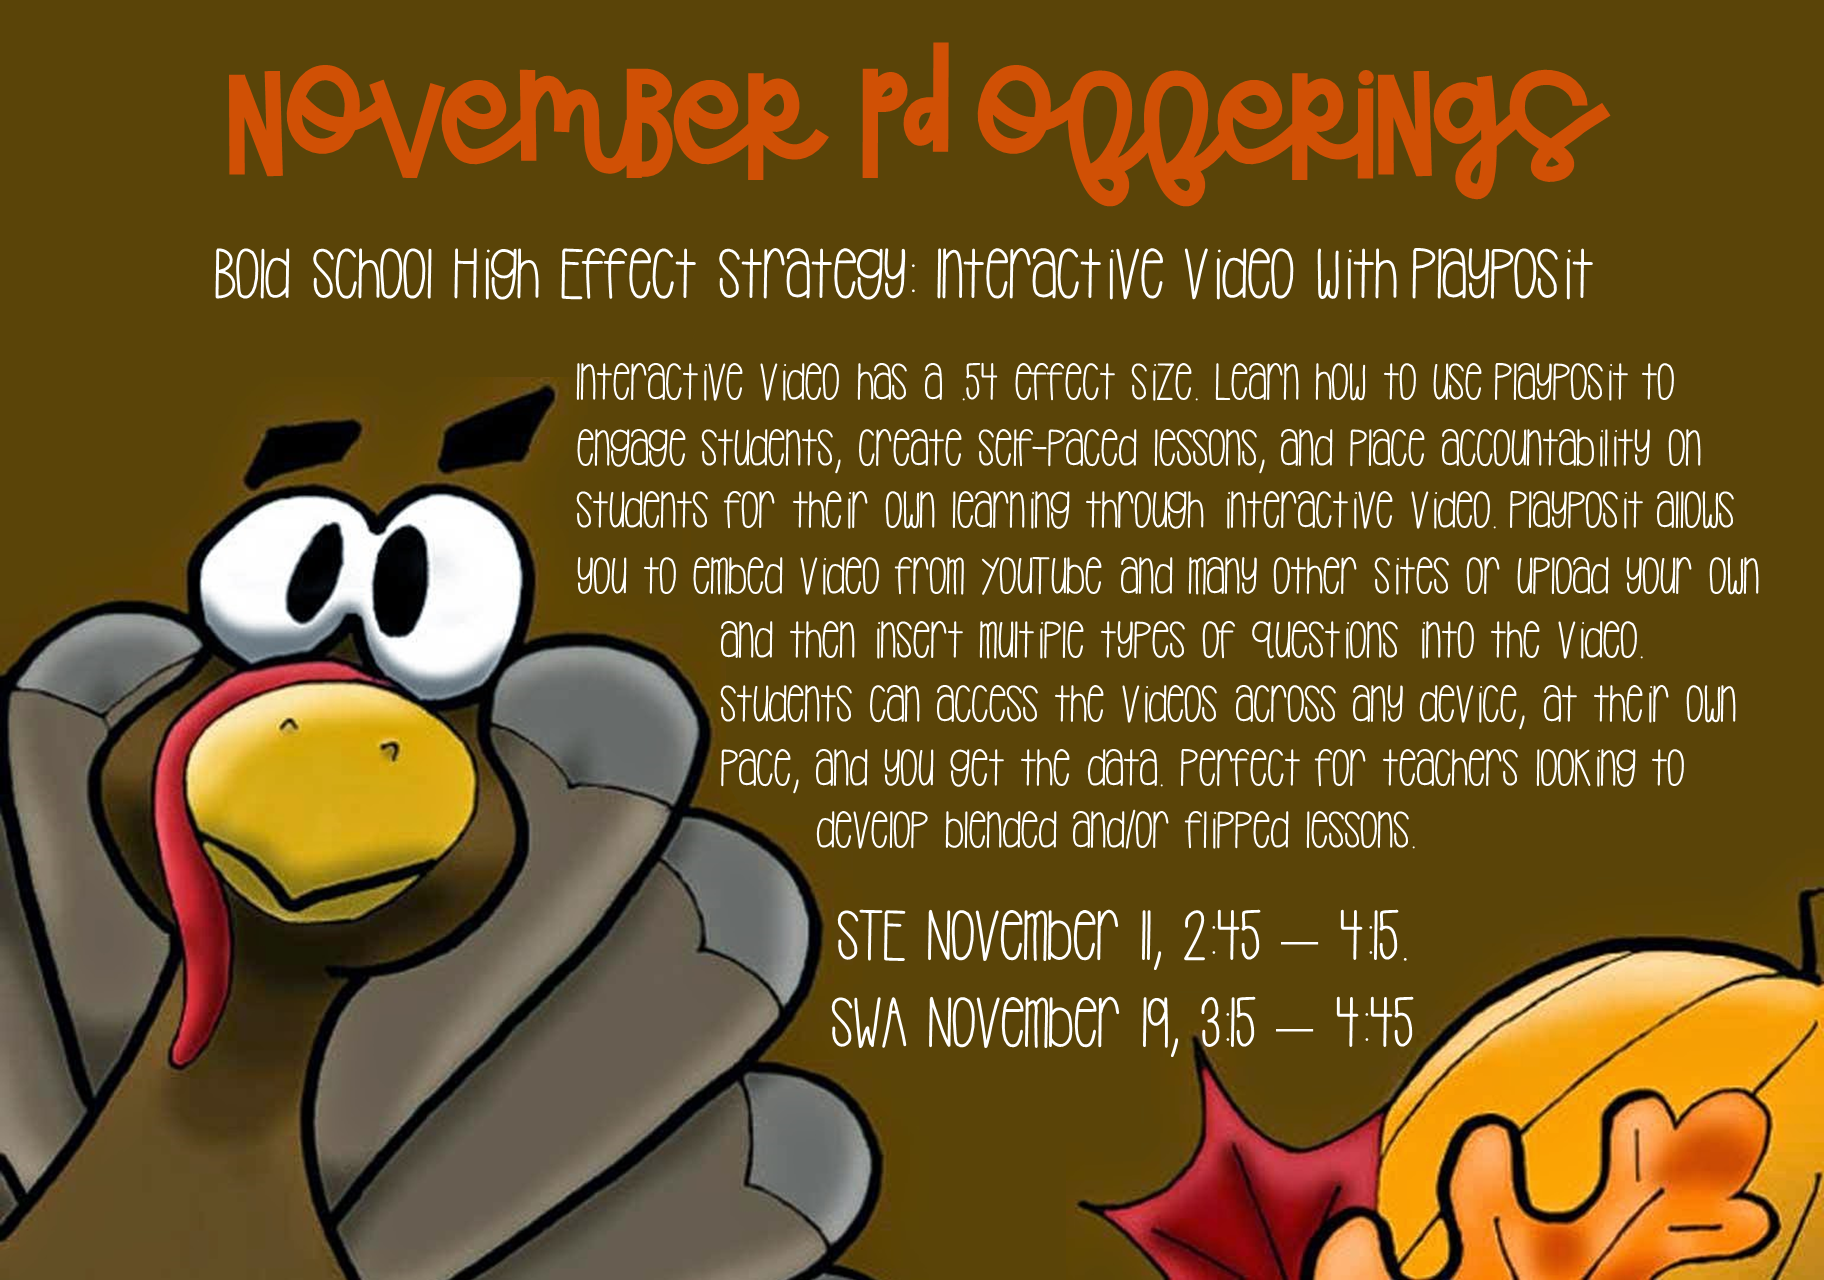 November PD